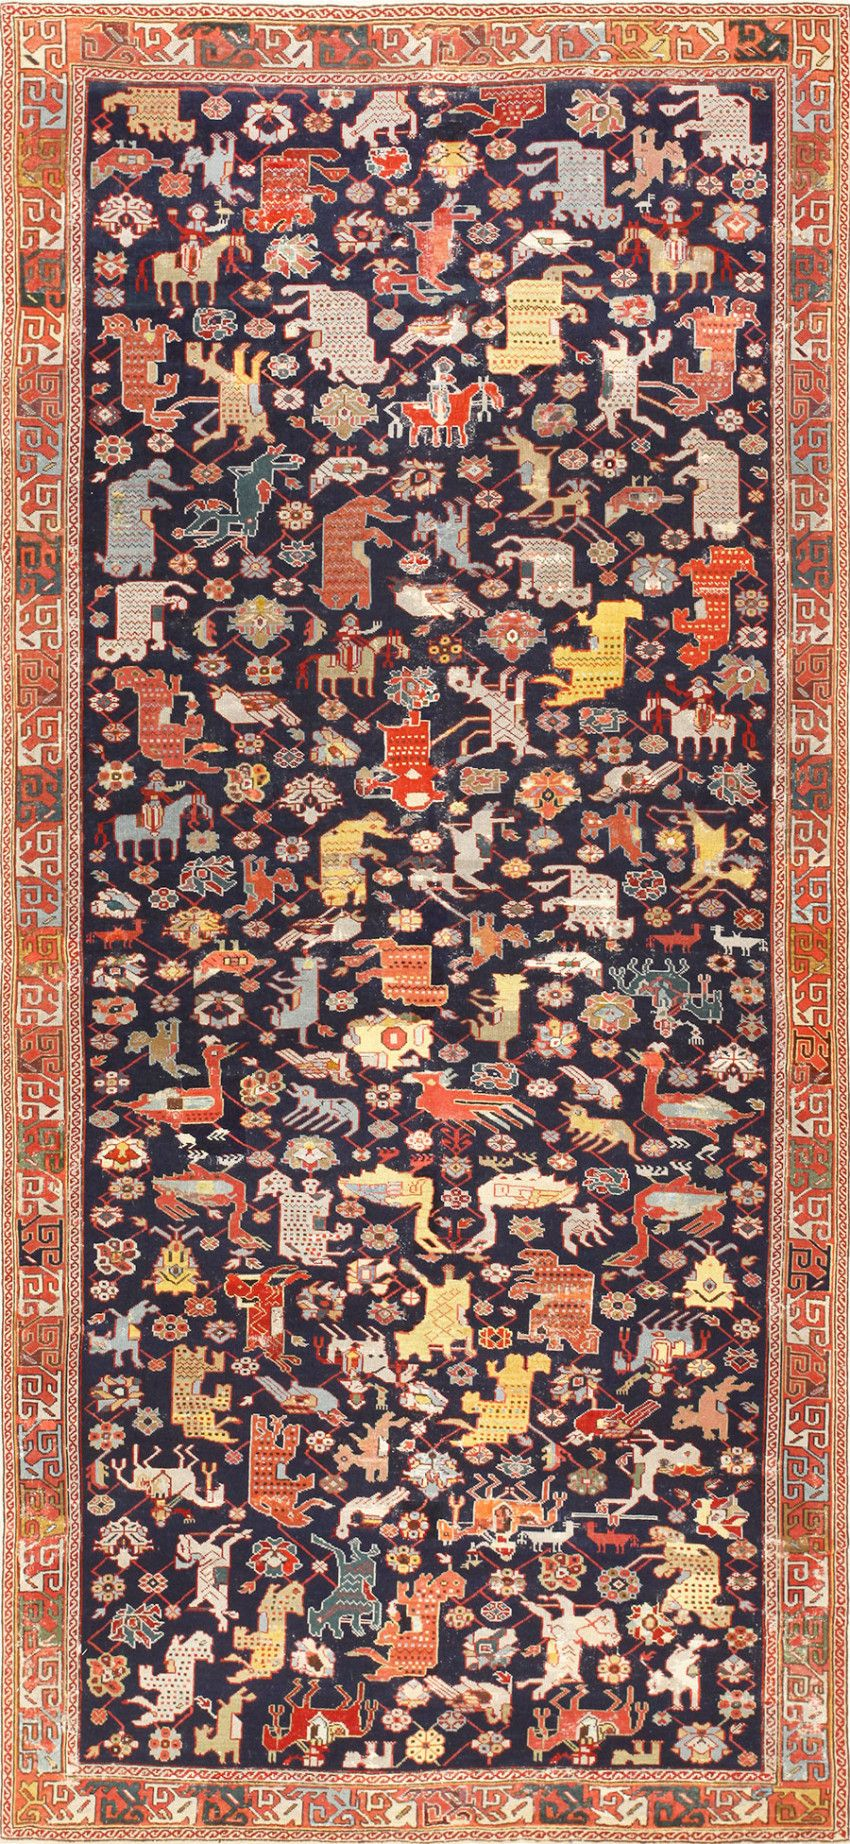 Caucasian Rug with Animal Design, 1.37 m x 2.74 m, Circa 1860, Nazmiyal gallery p.42